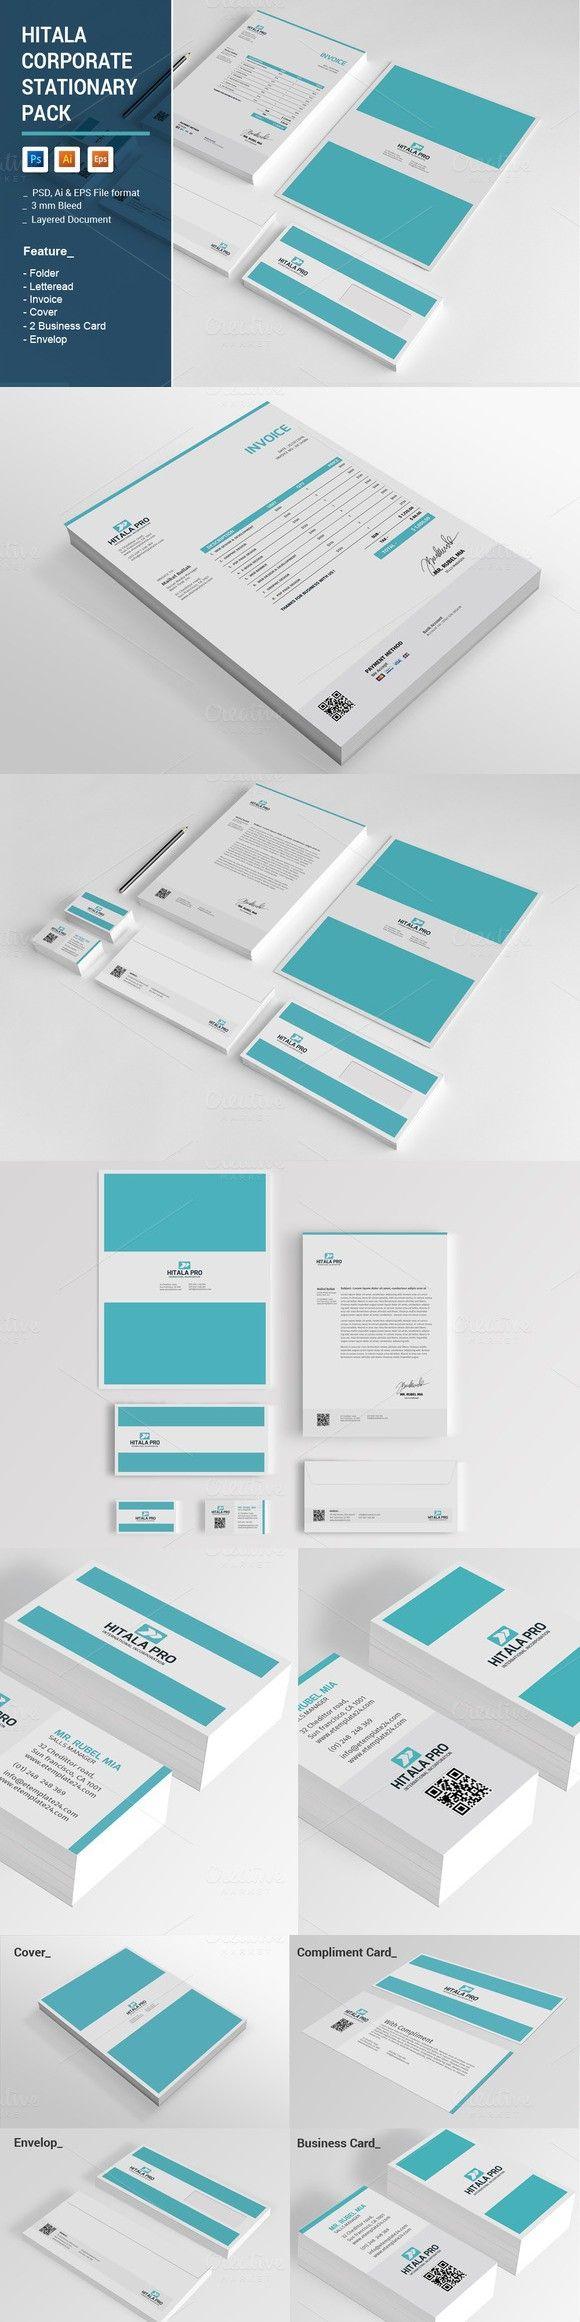 Hitala Corporate Stationary Pack